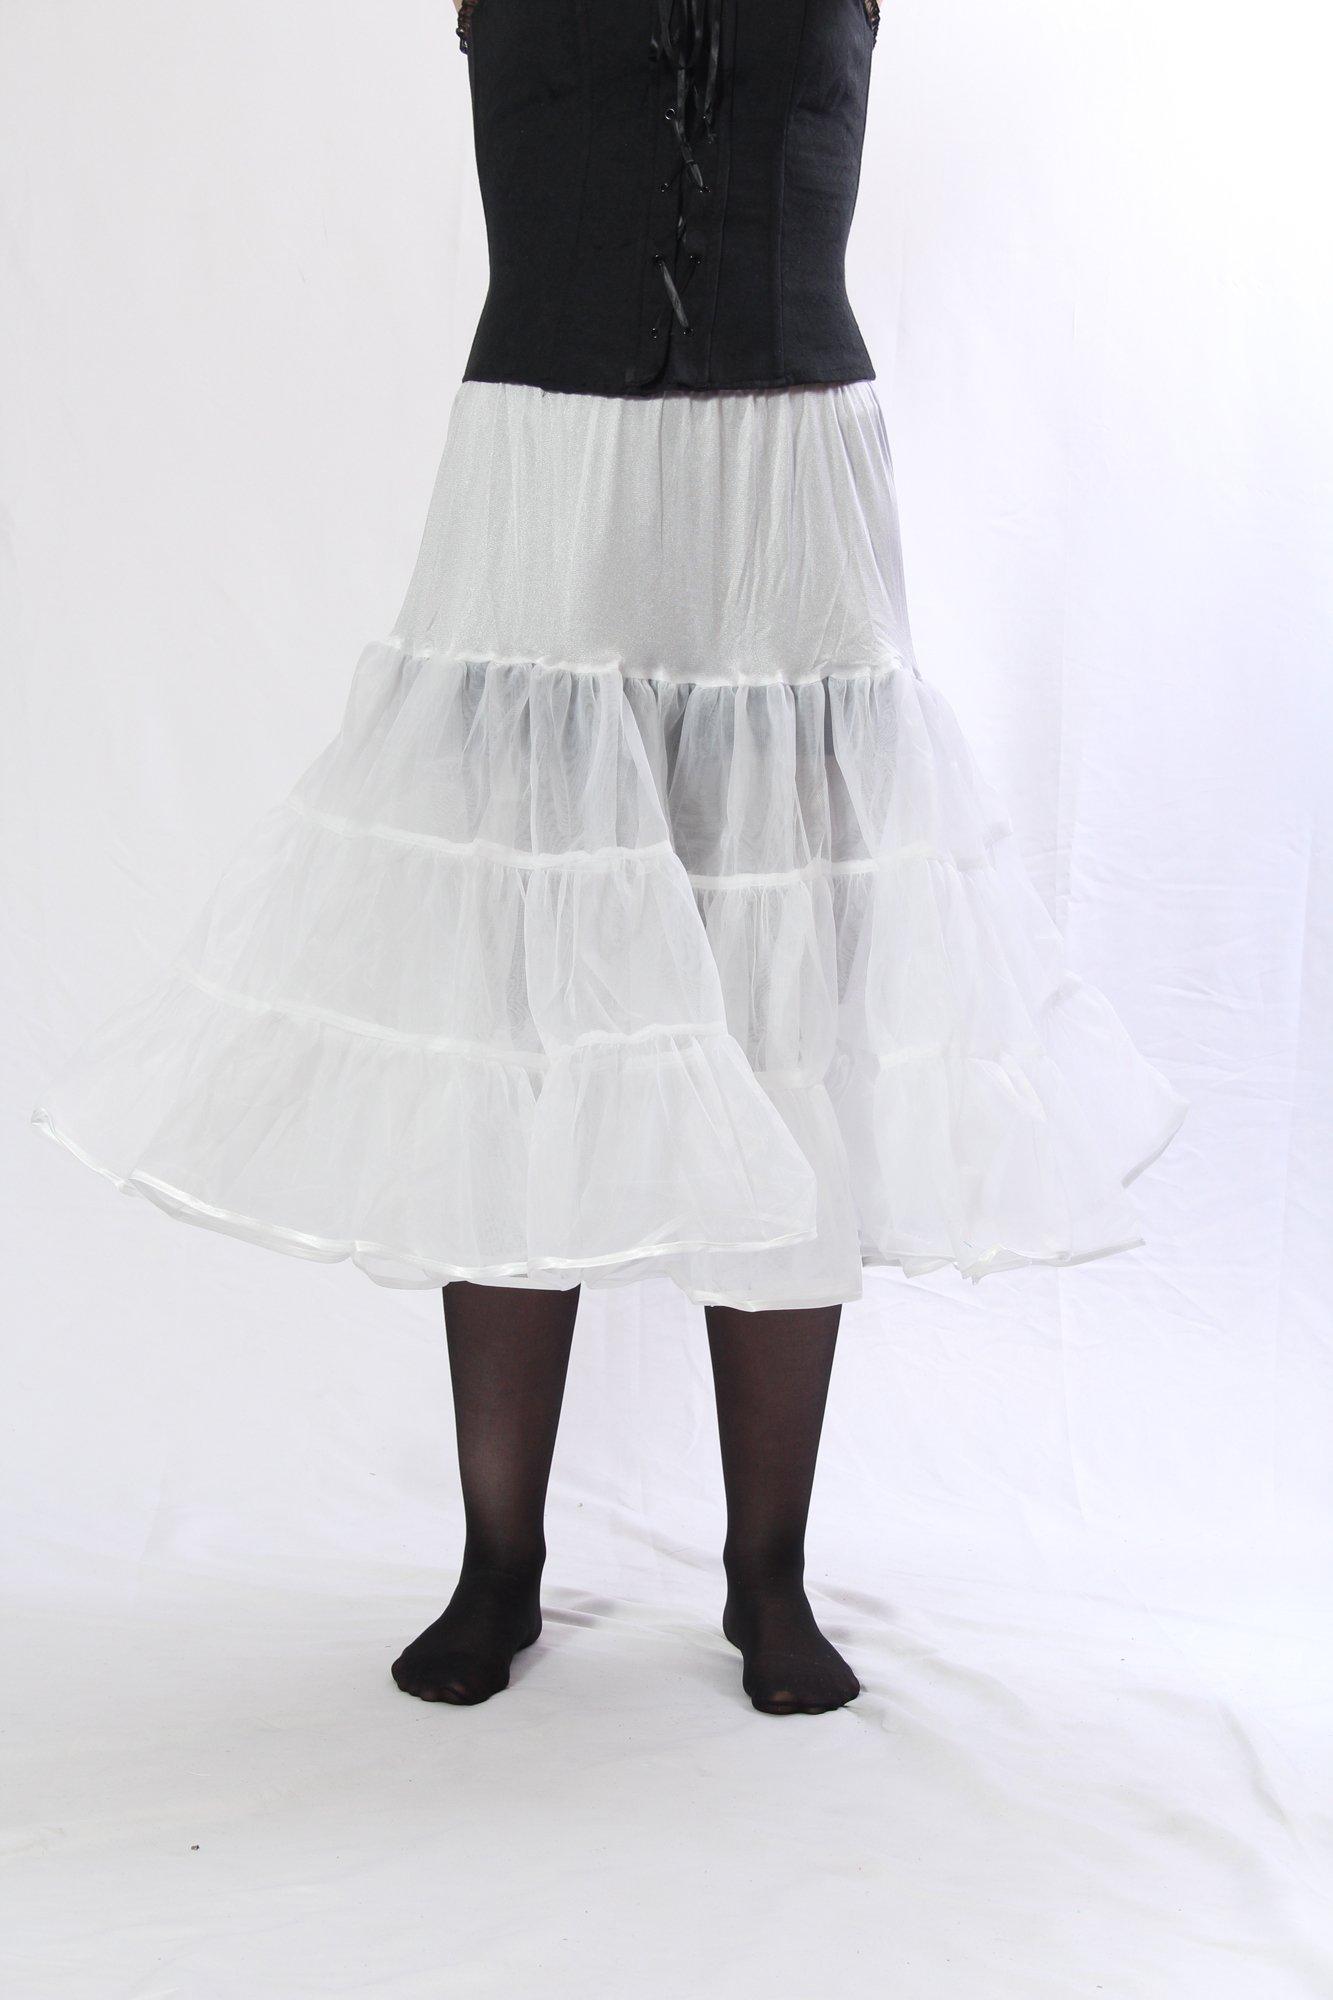 Petticoat Crinoline. Great petticoat skirt for poodle skirts, Petticoat dresses, Vintage dresses, or as Rockabilly Adult Tutu Skirt. 25'' length; Tulle fabric - White Petticoat  L/XL